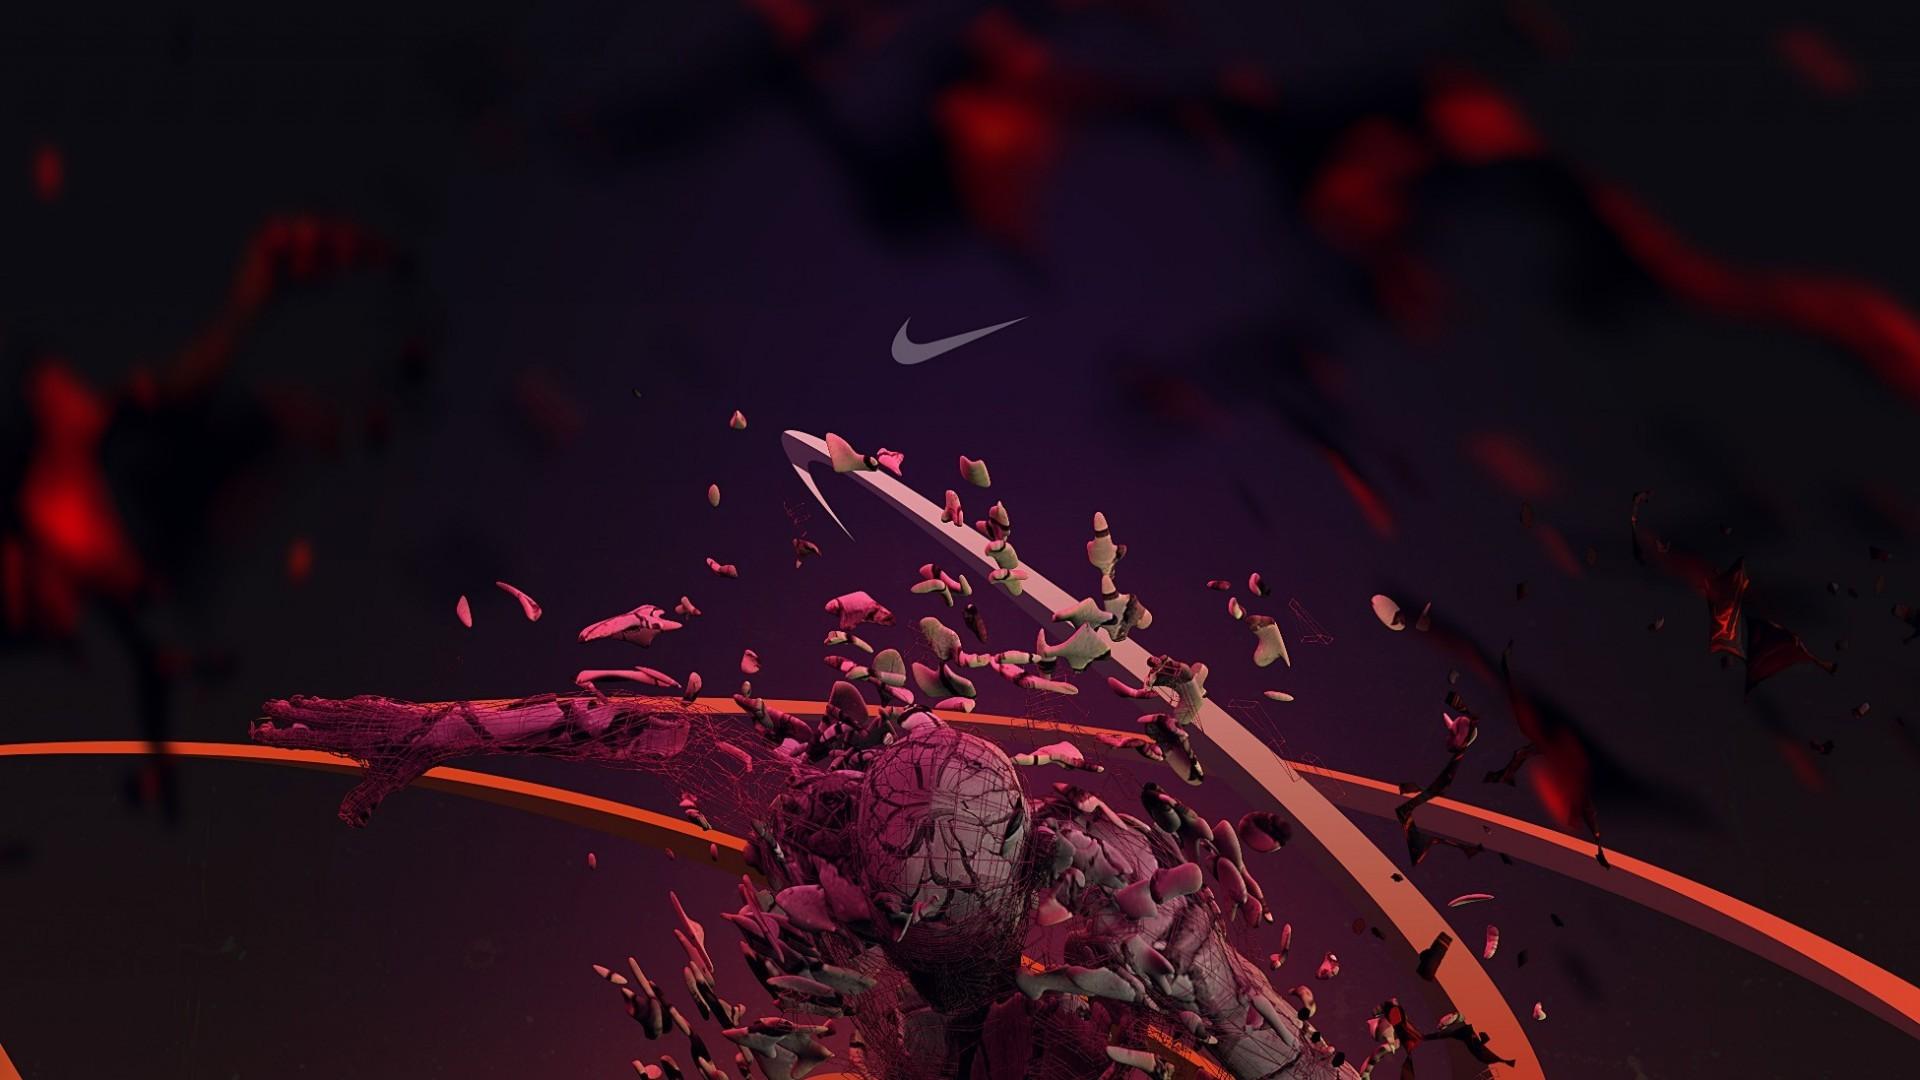 Res: 1920x1080, Nike Basketball Wallpaper Hd wallpaper